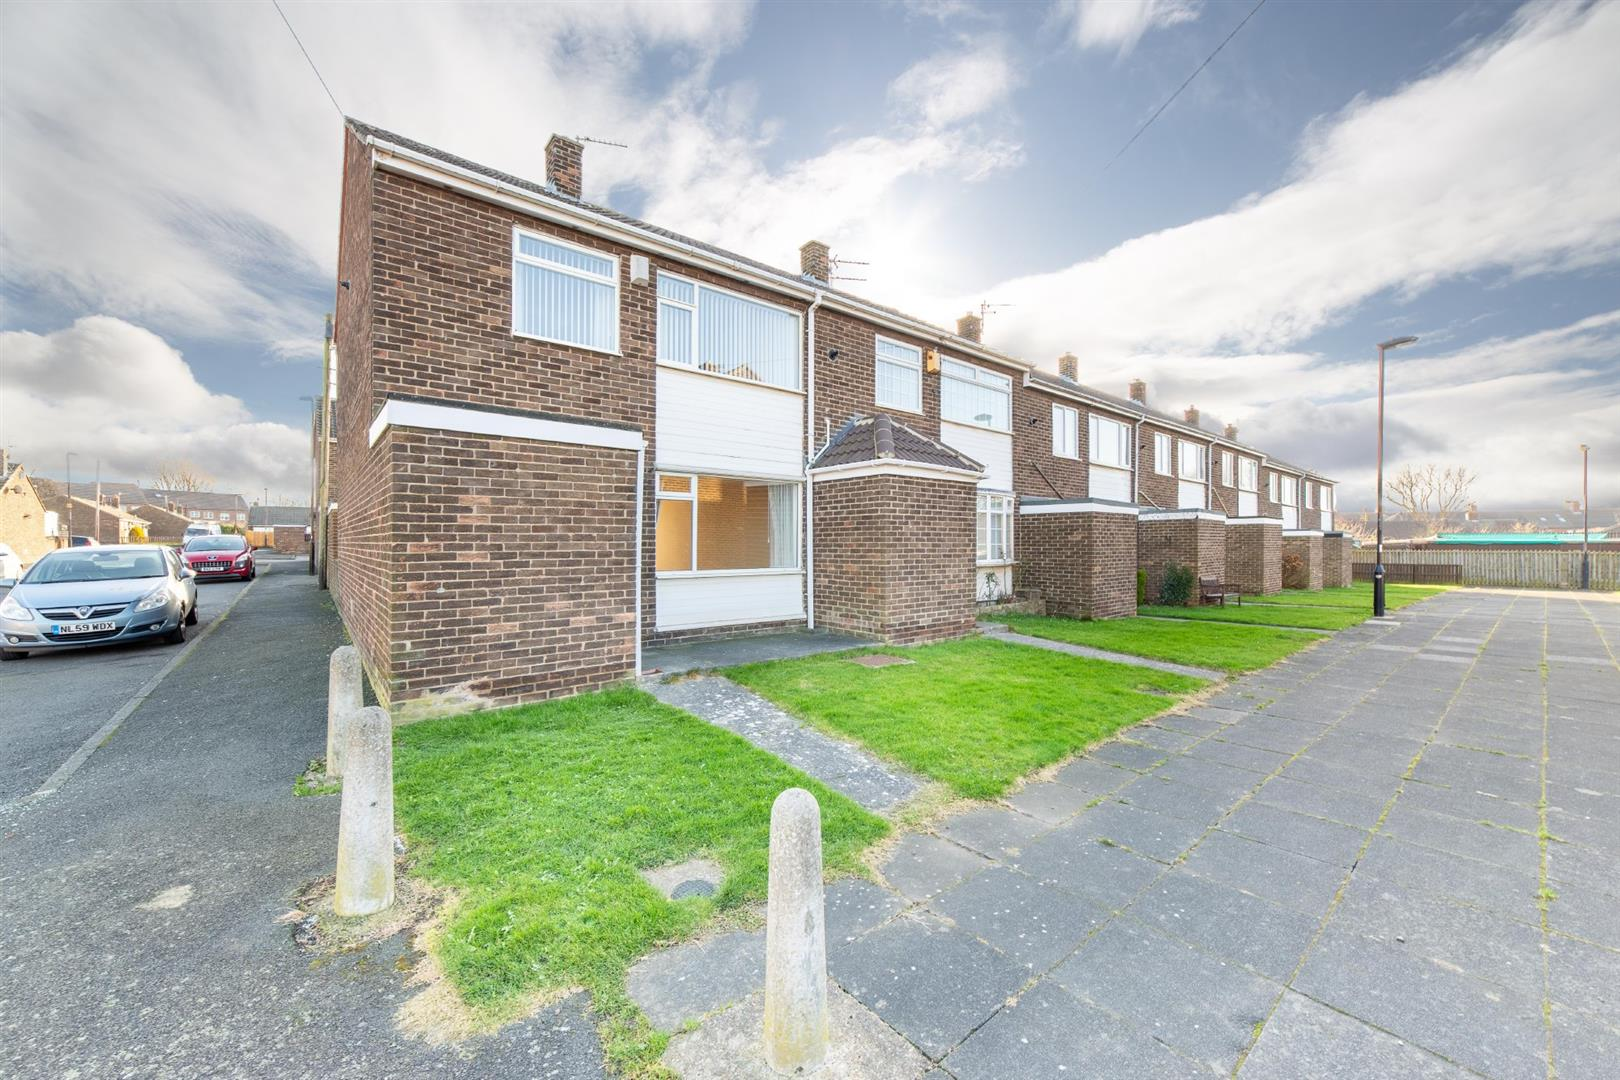 2 bed end of terrace house for sale in Cramlington, NE23 7NU  - Property Image 1